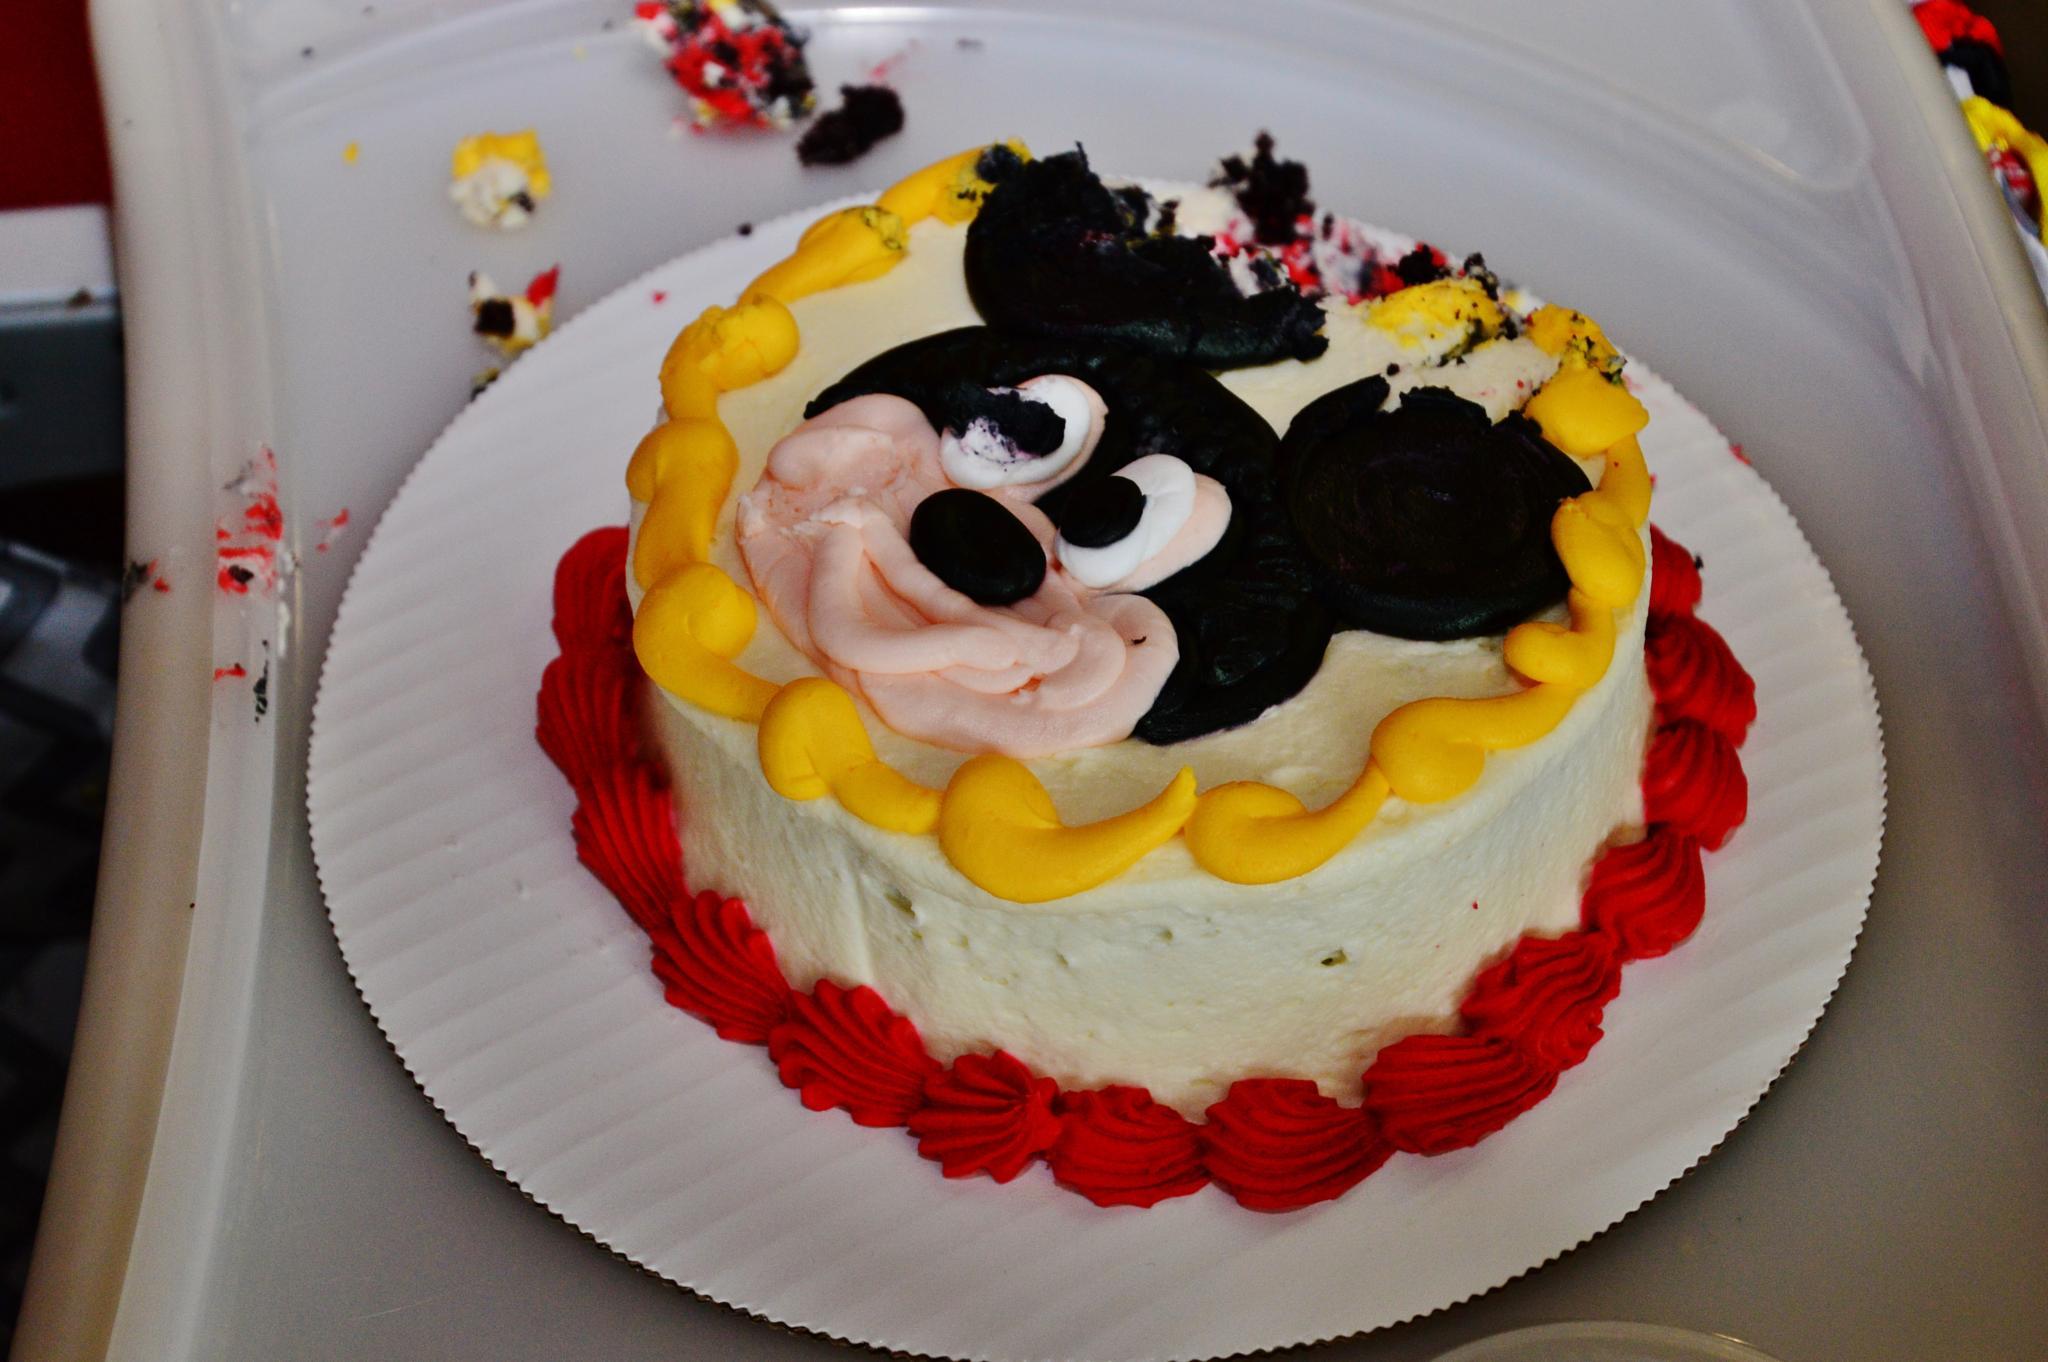 Birthday Cake by Doug Fosnight